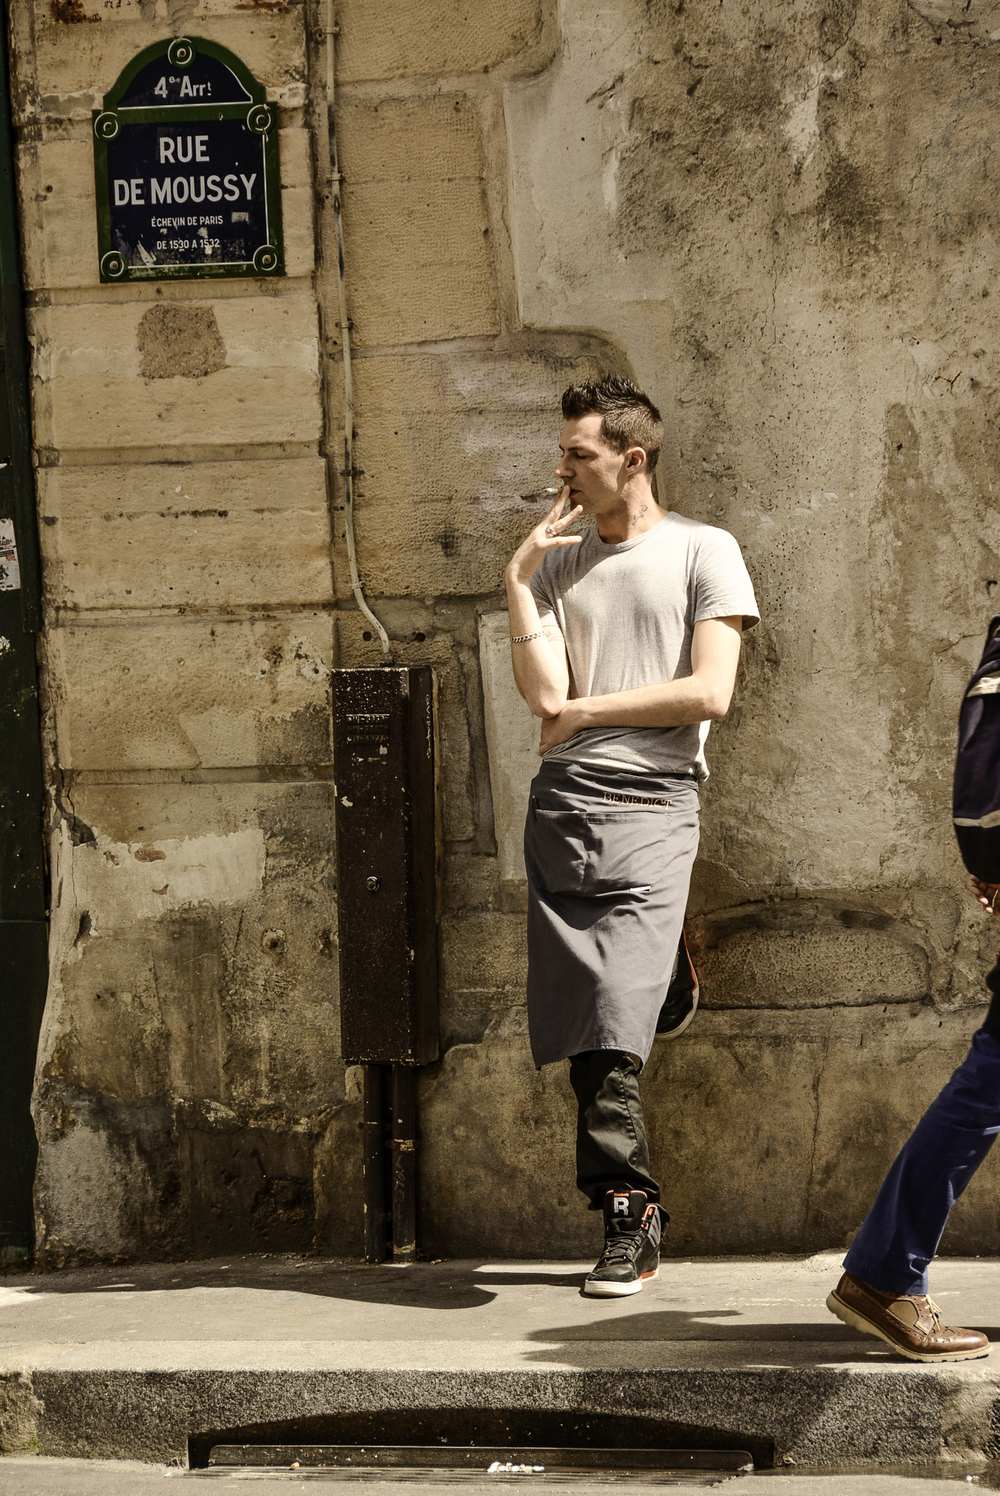 Paris_20140505_151.jpg